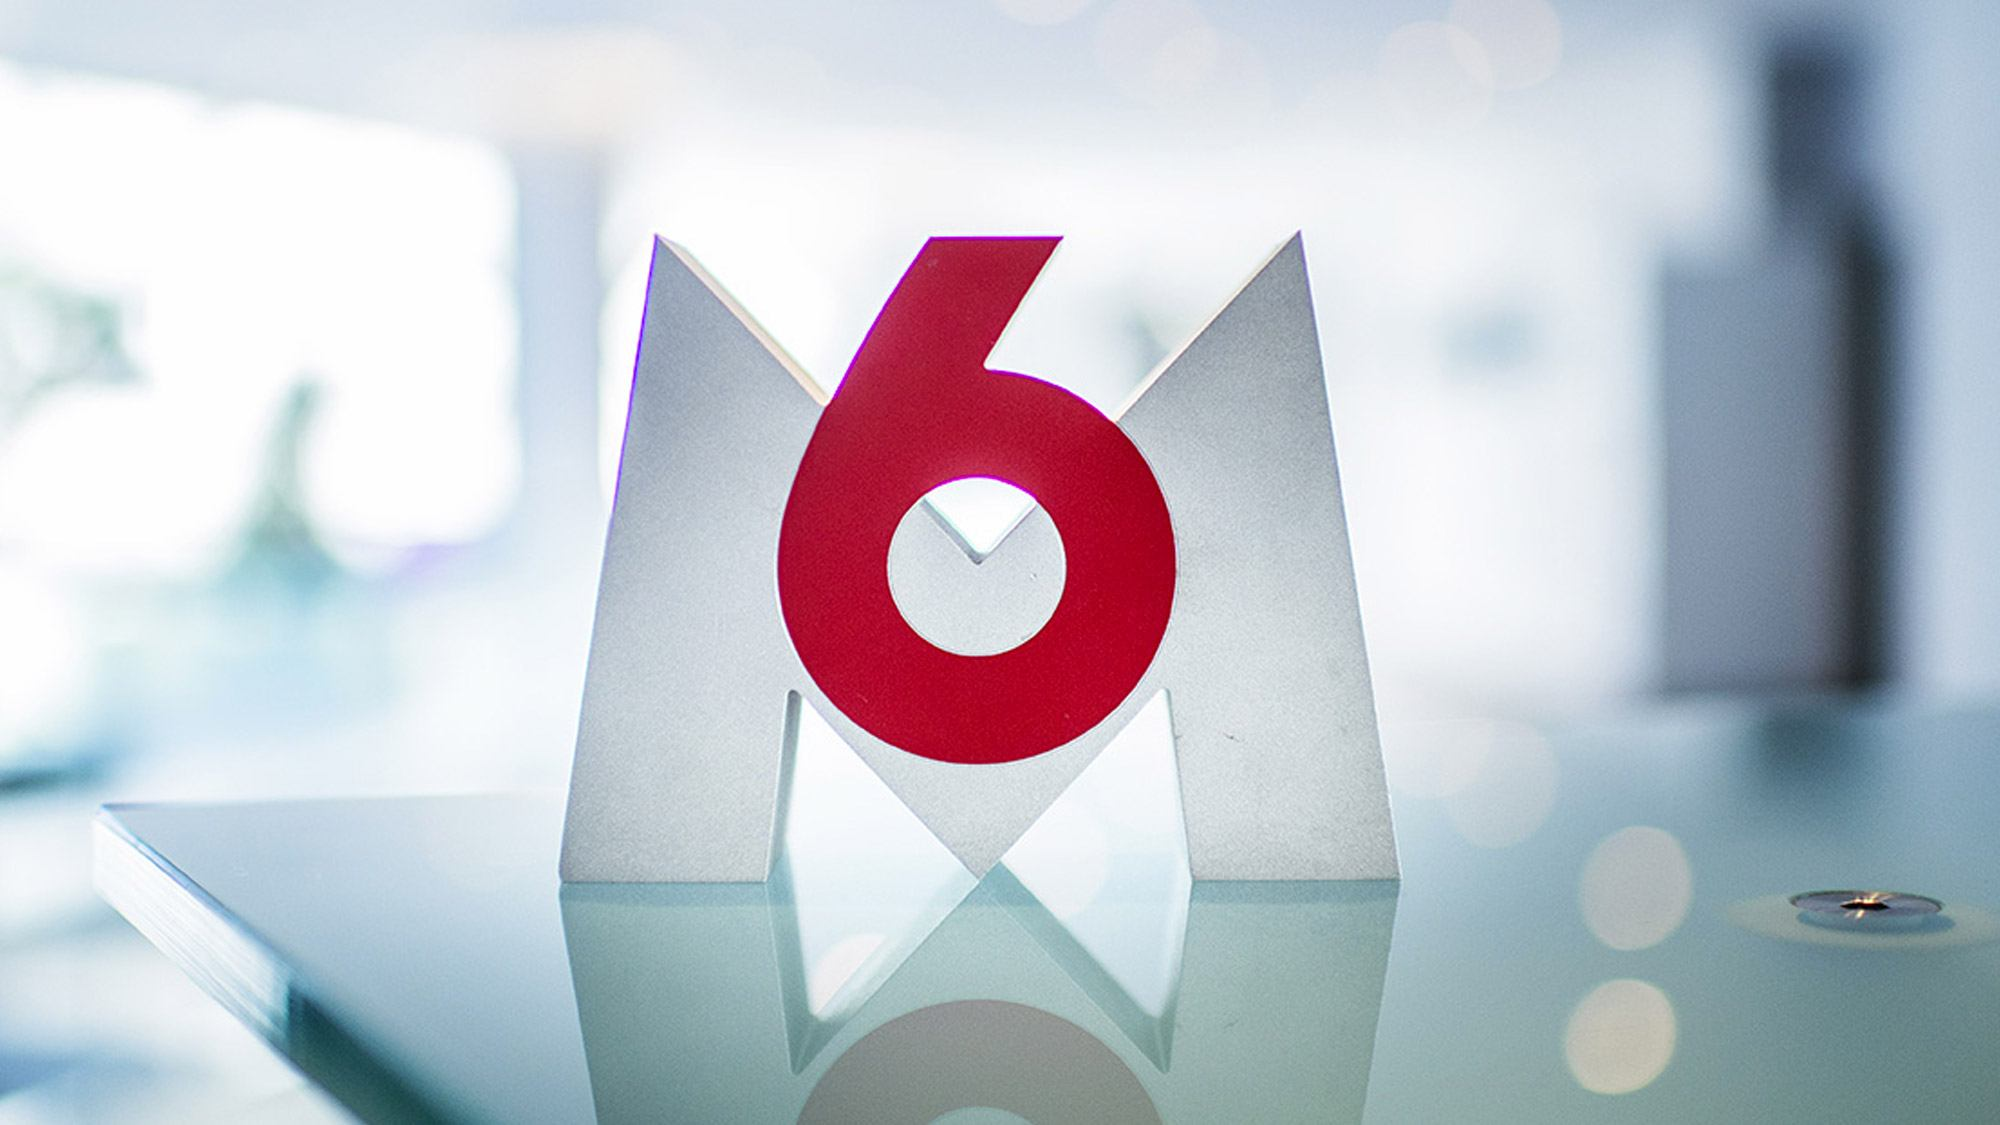 Logo de M6.